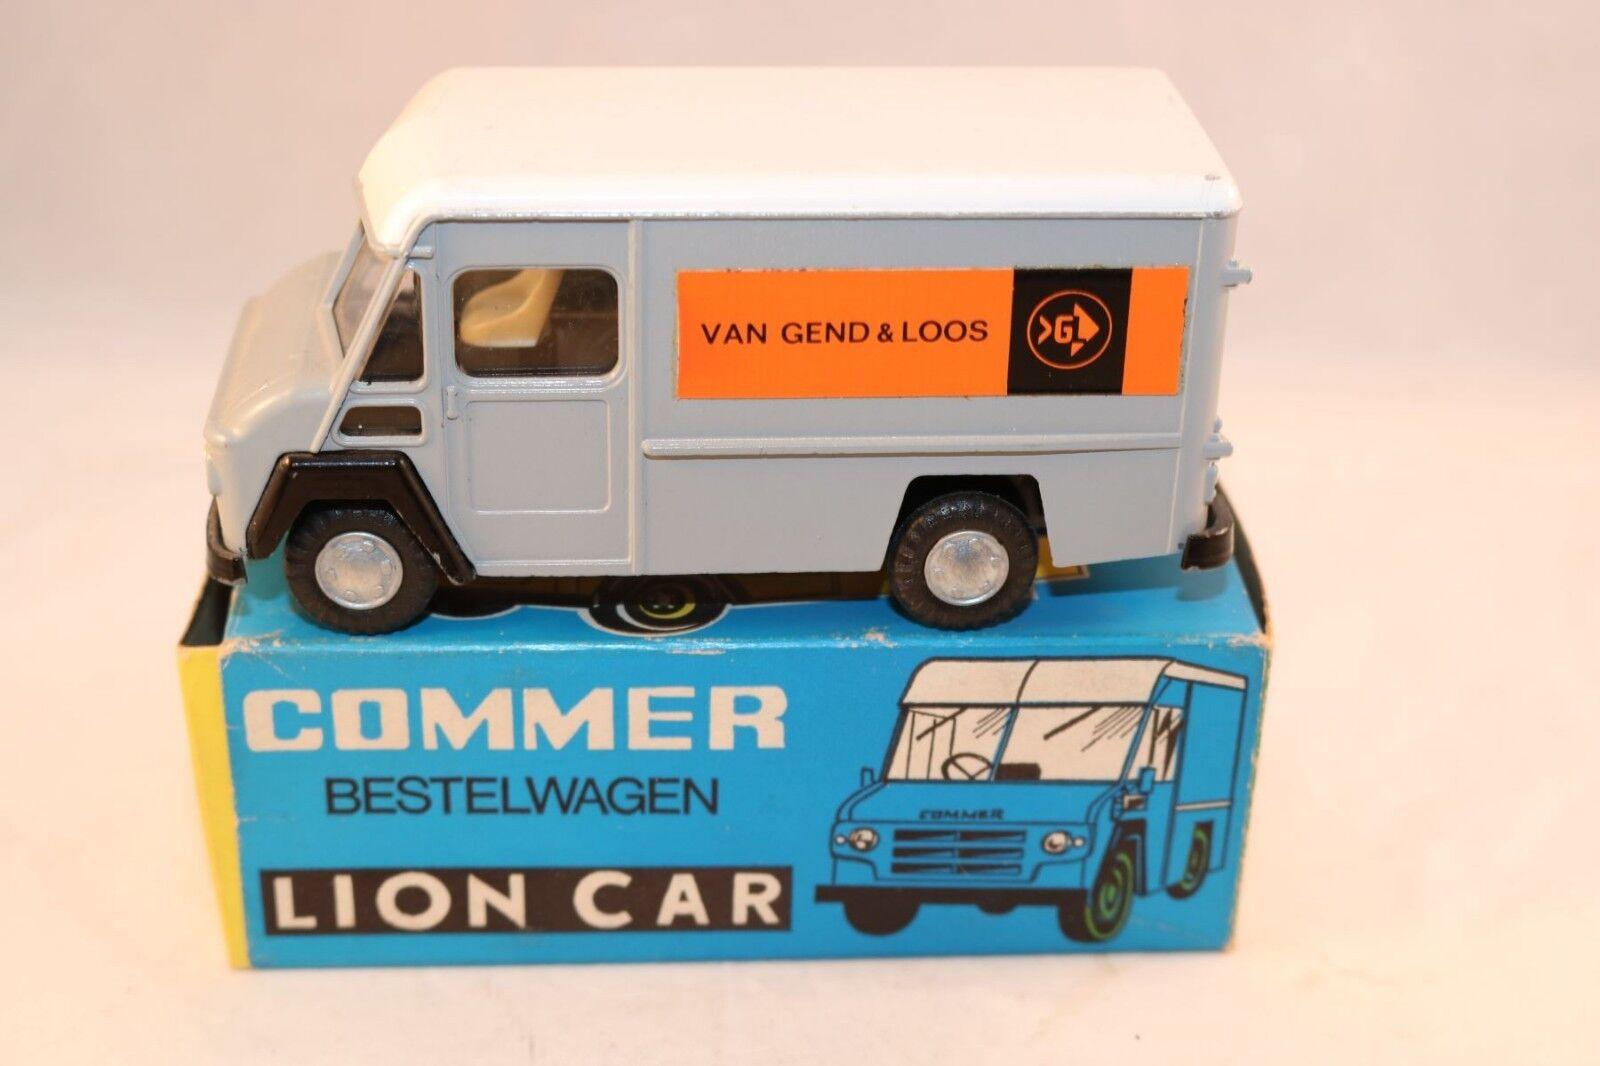 Lion Car No.54 Commer Bestelwagen Van Gend & Loos near mint in rare bleu box